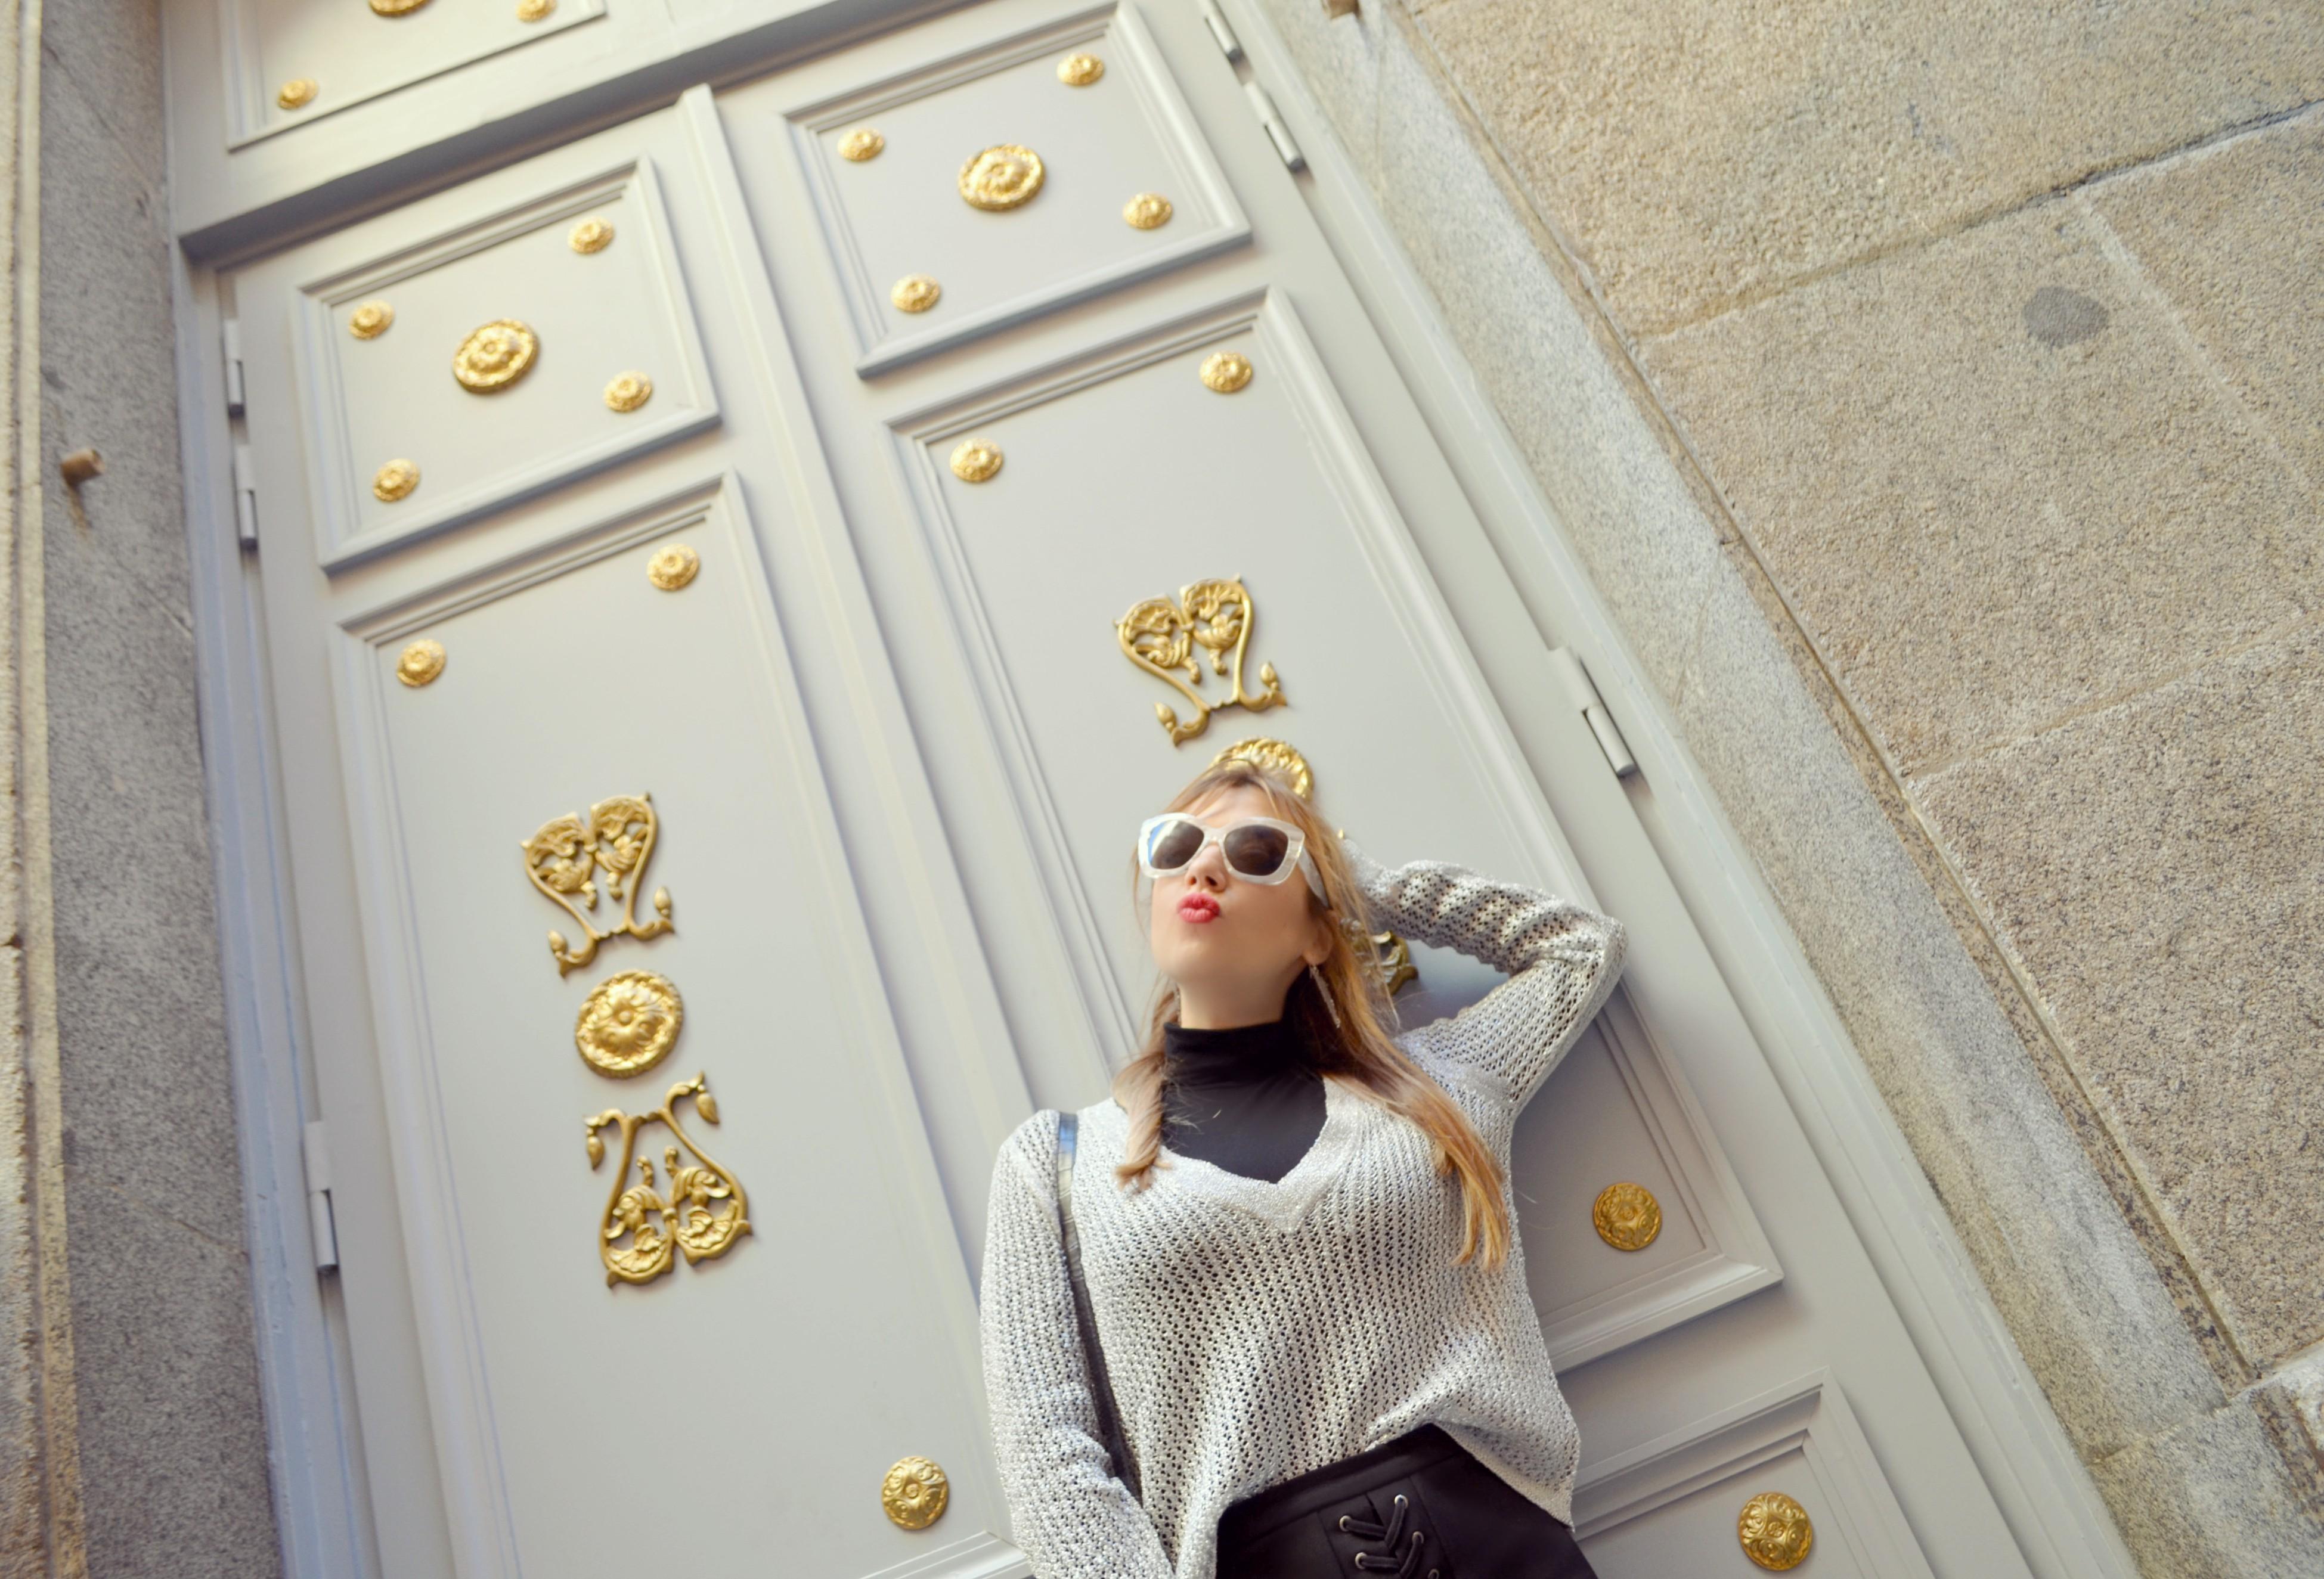 Madrid-street-style-blog-de-moda-ChicAdicta-Amichi-look-Chic-Adicta-white-sunglasses-silver-style-blusa-plateada-PiensaenChic-Piensa-en-Chic